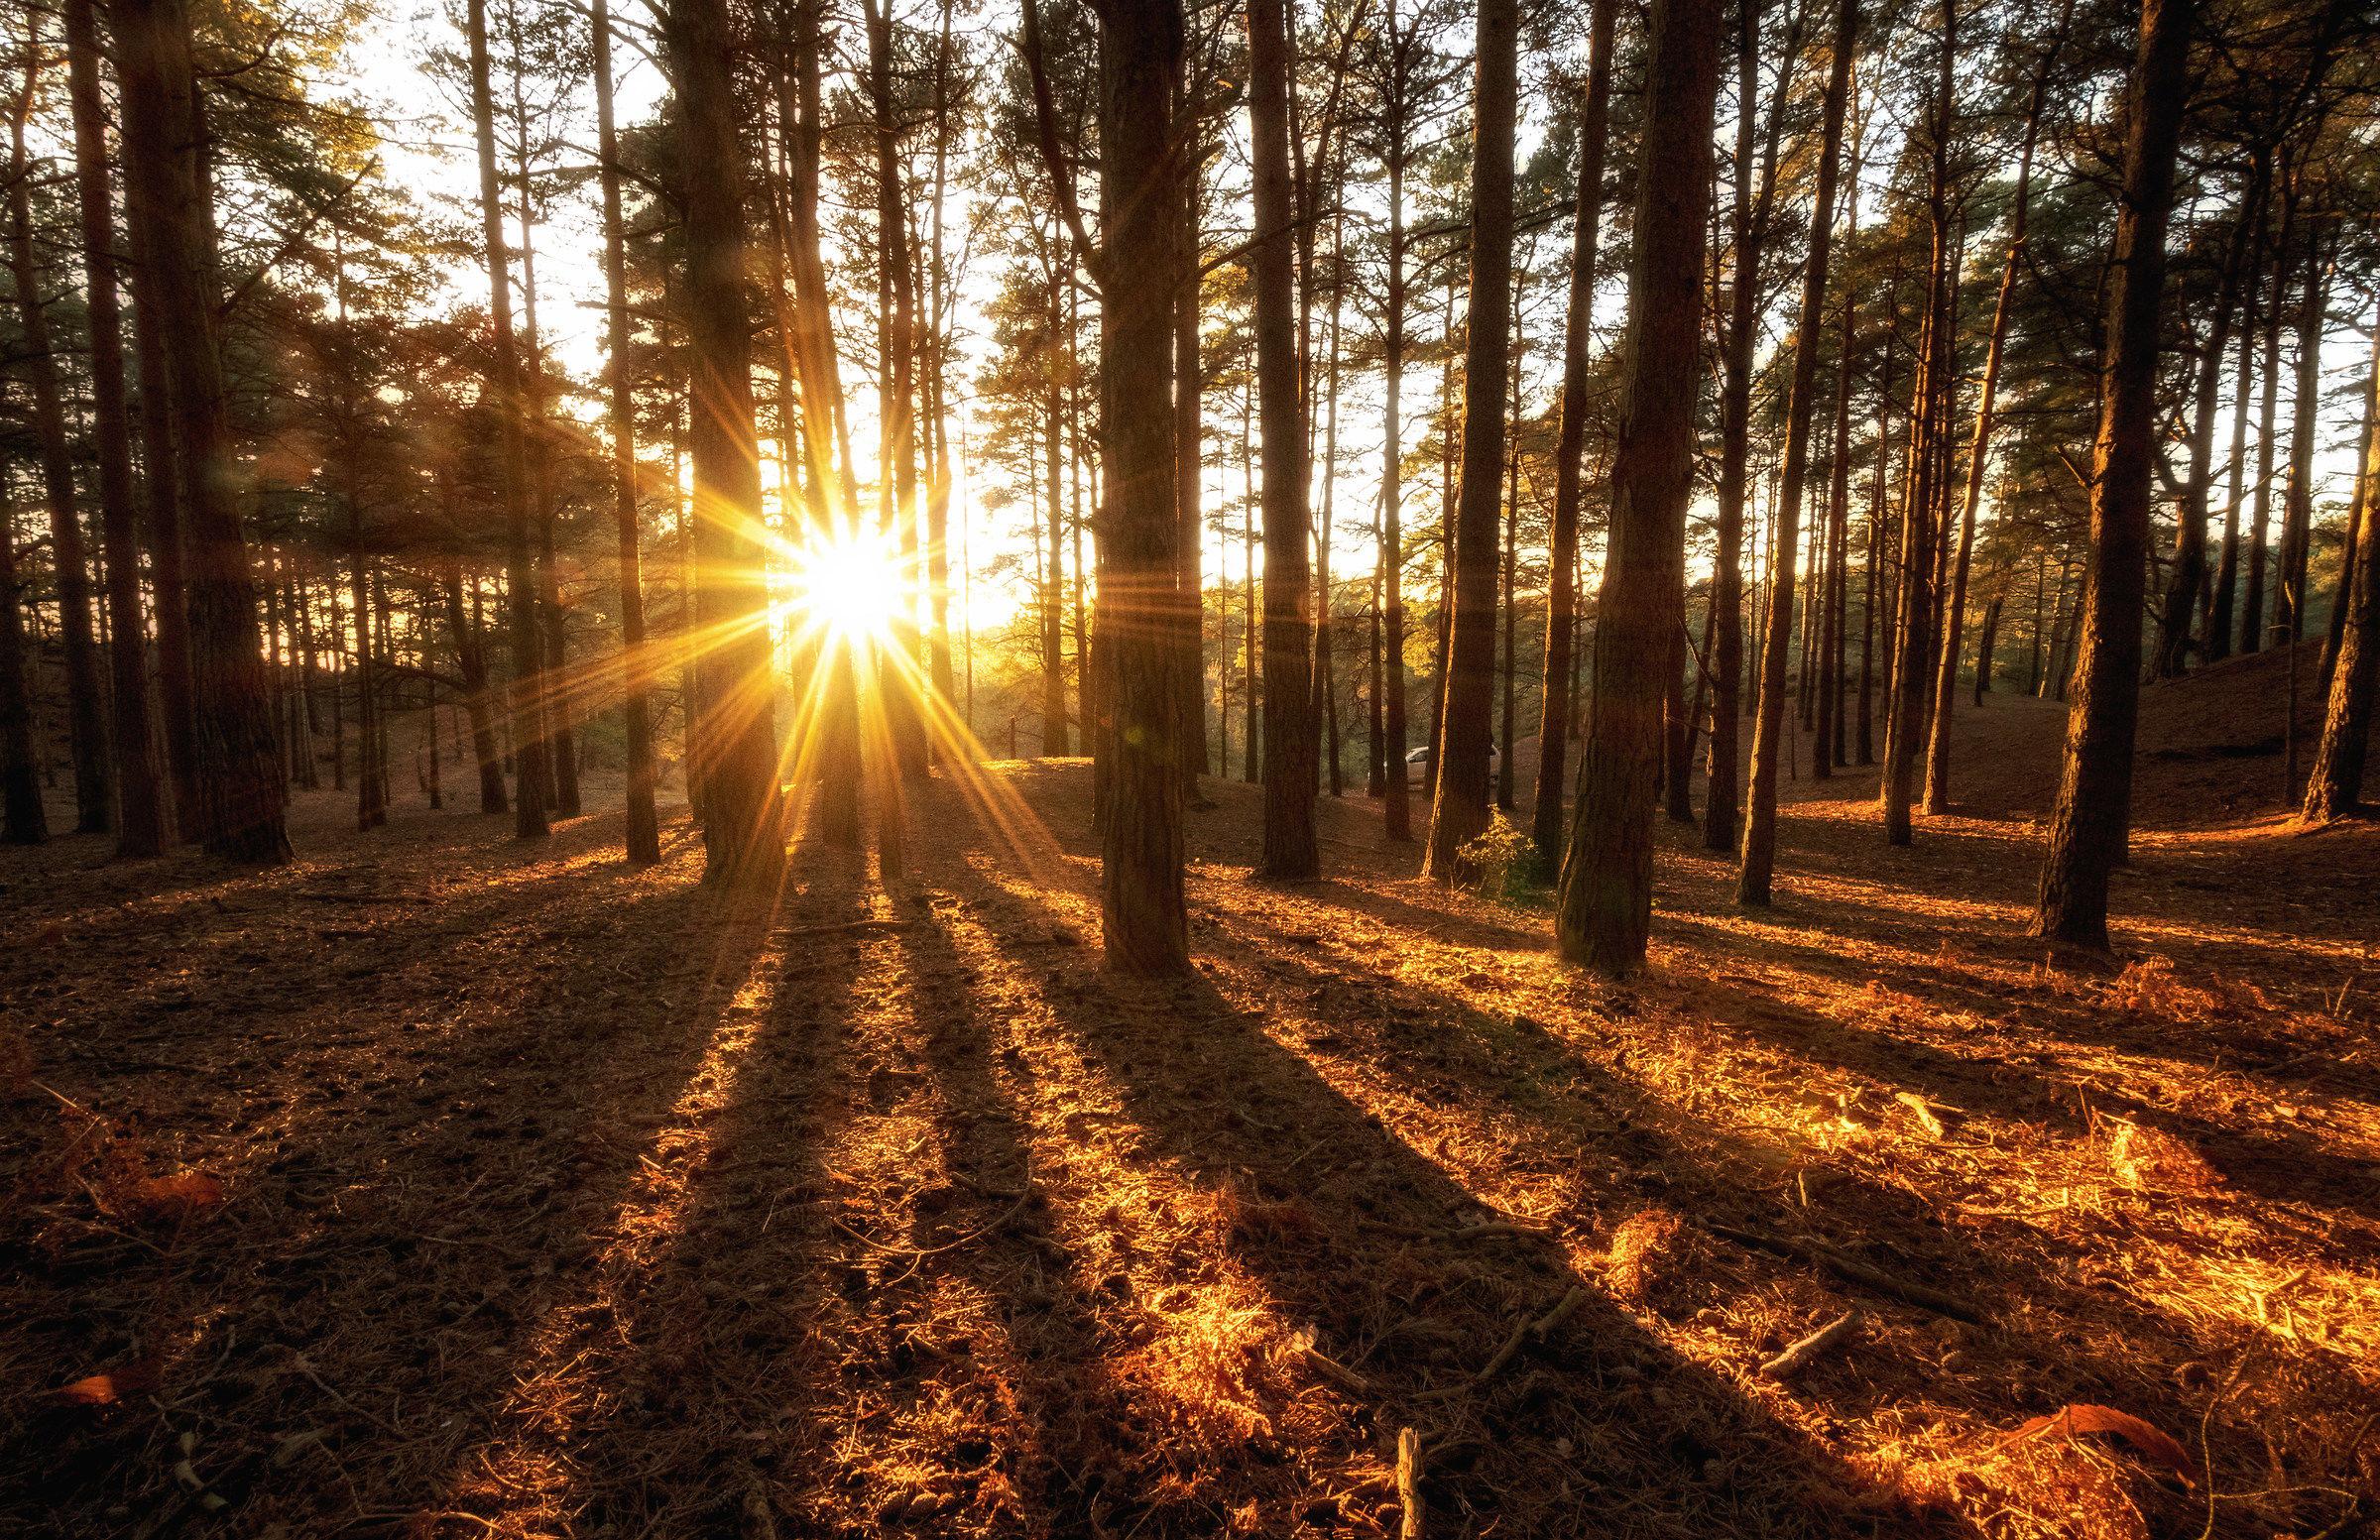 Last Rays of Sunlight...